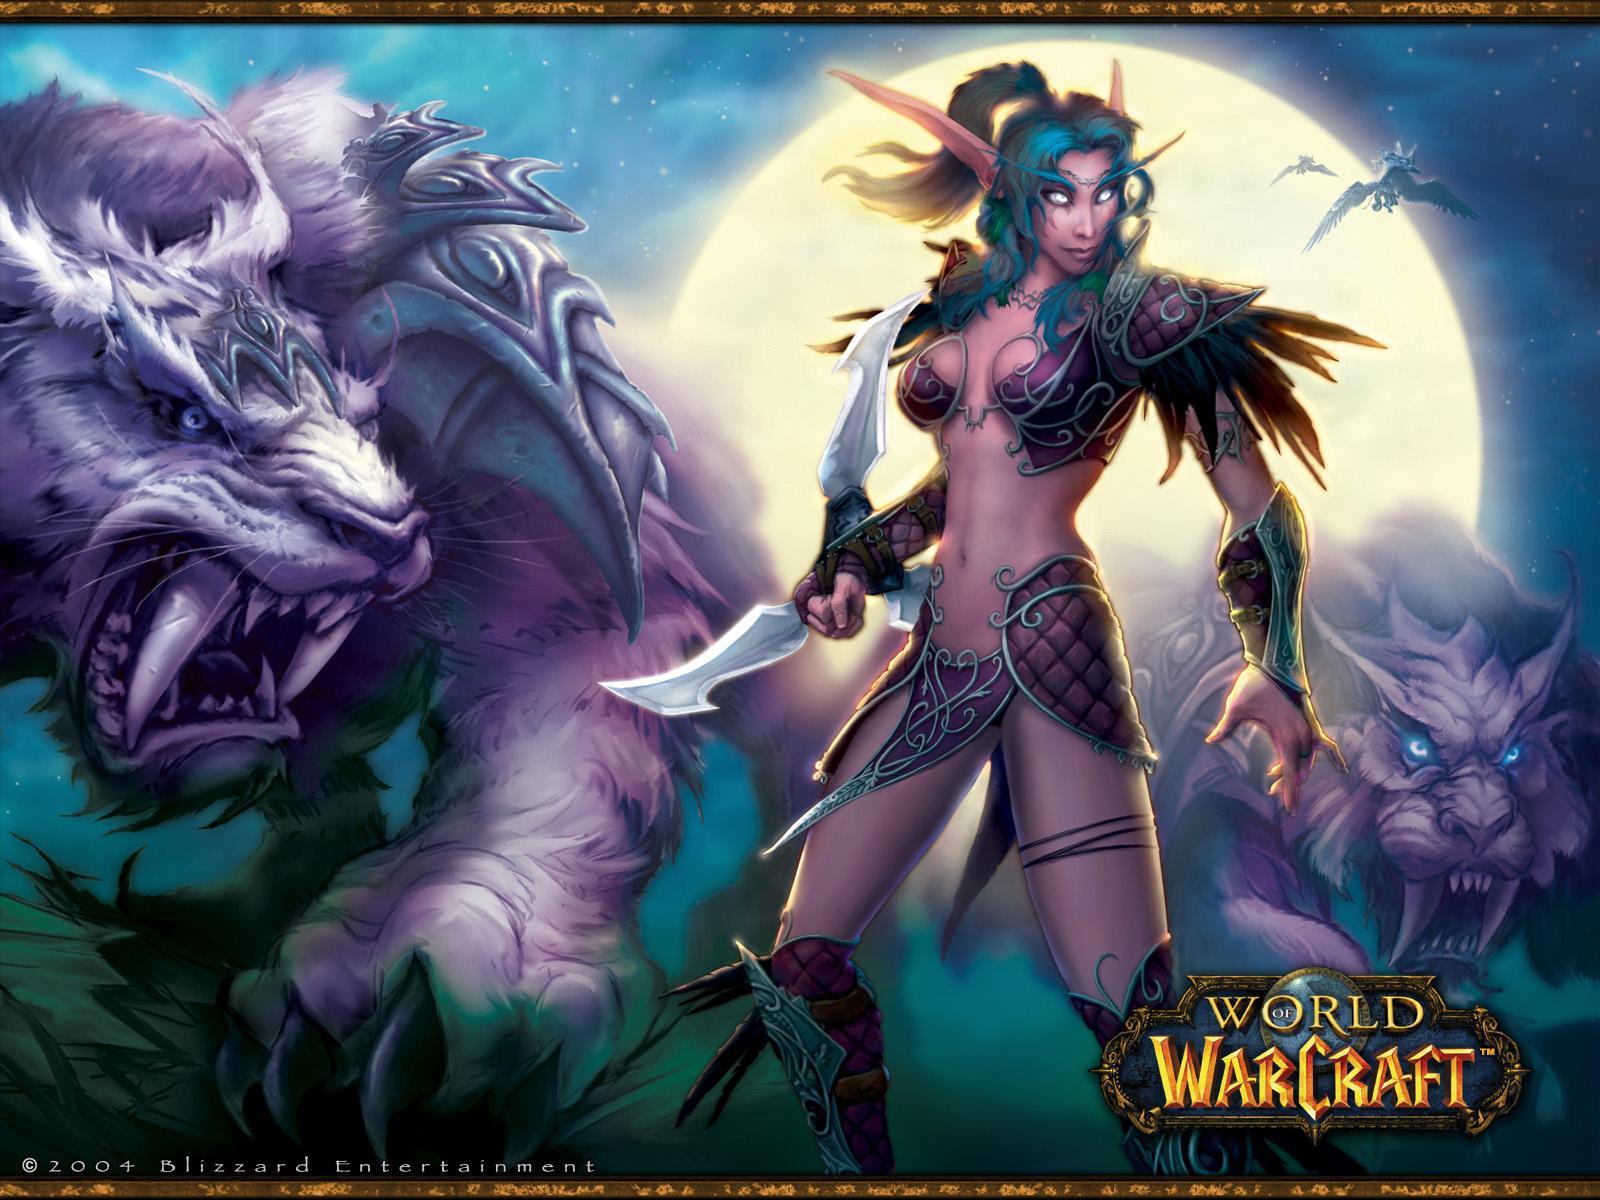 World of Warcraft wallpaper 2